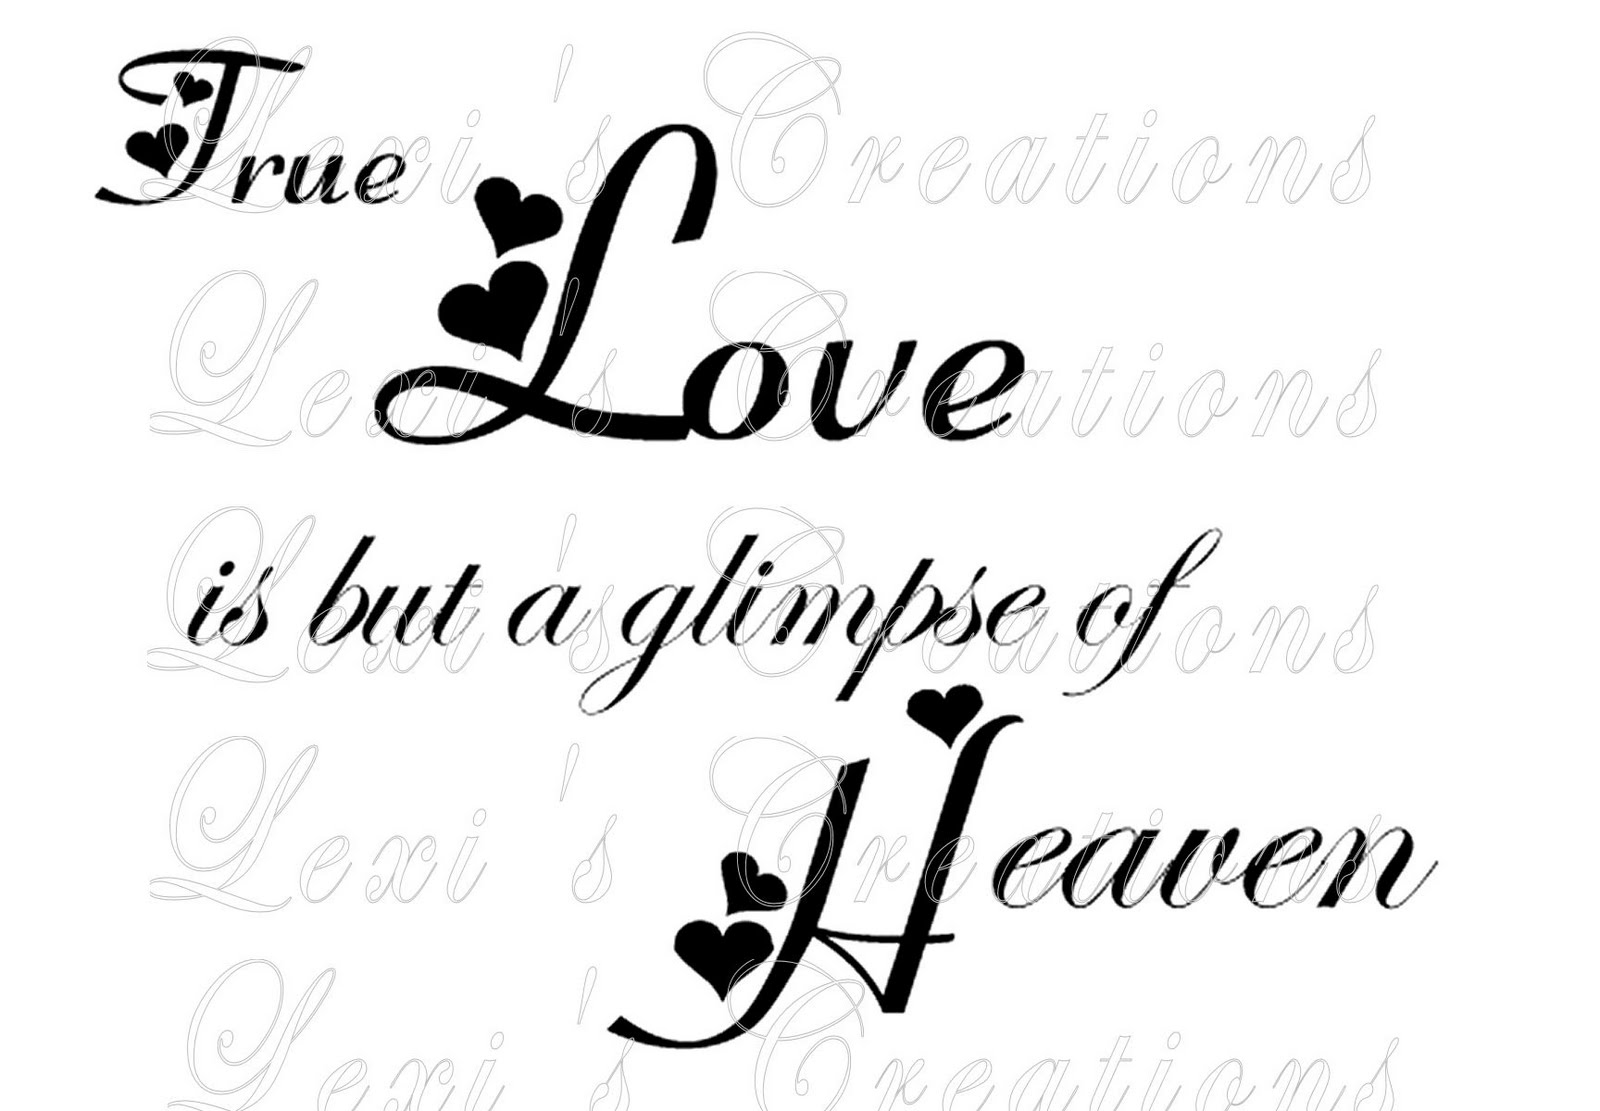 Love Word Art Designs Related Keywords & Suggestions - Love Word ...